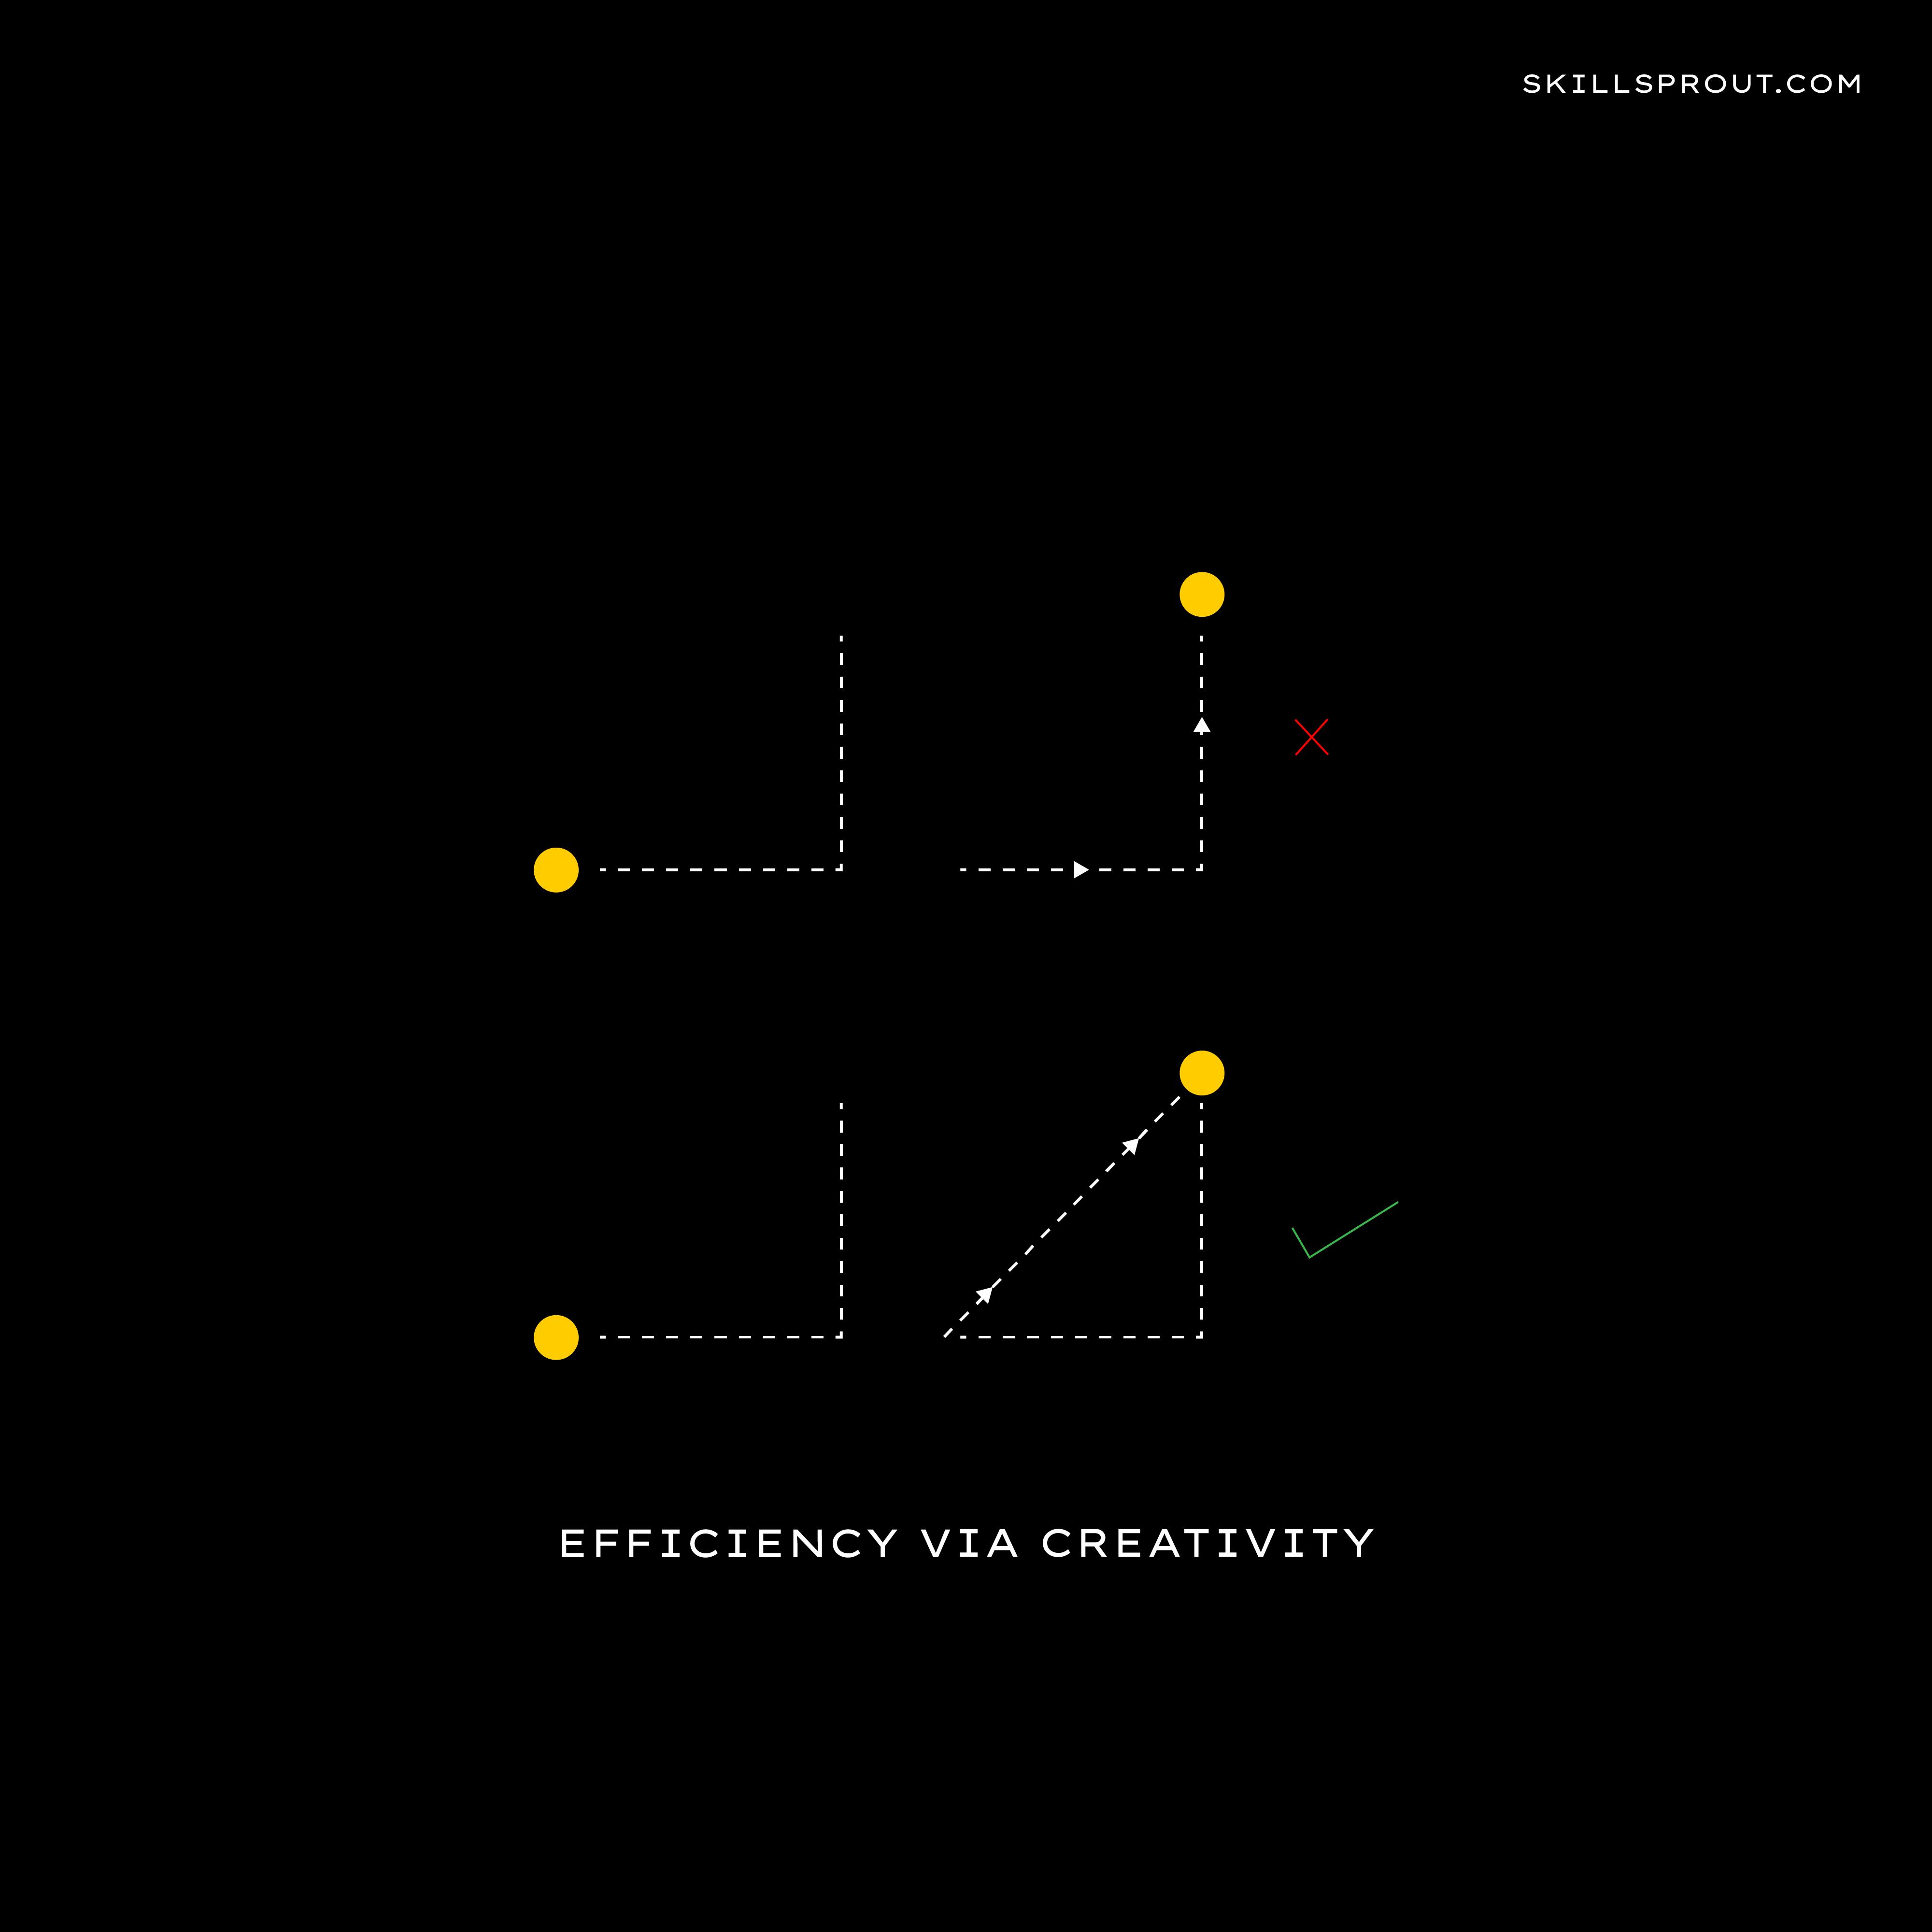 Efficiency via creativity